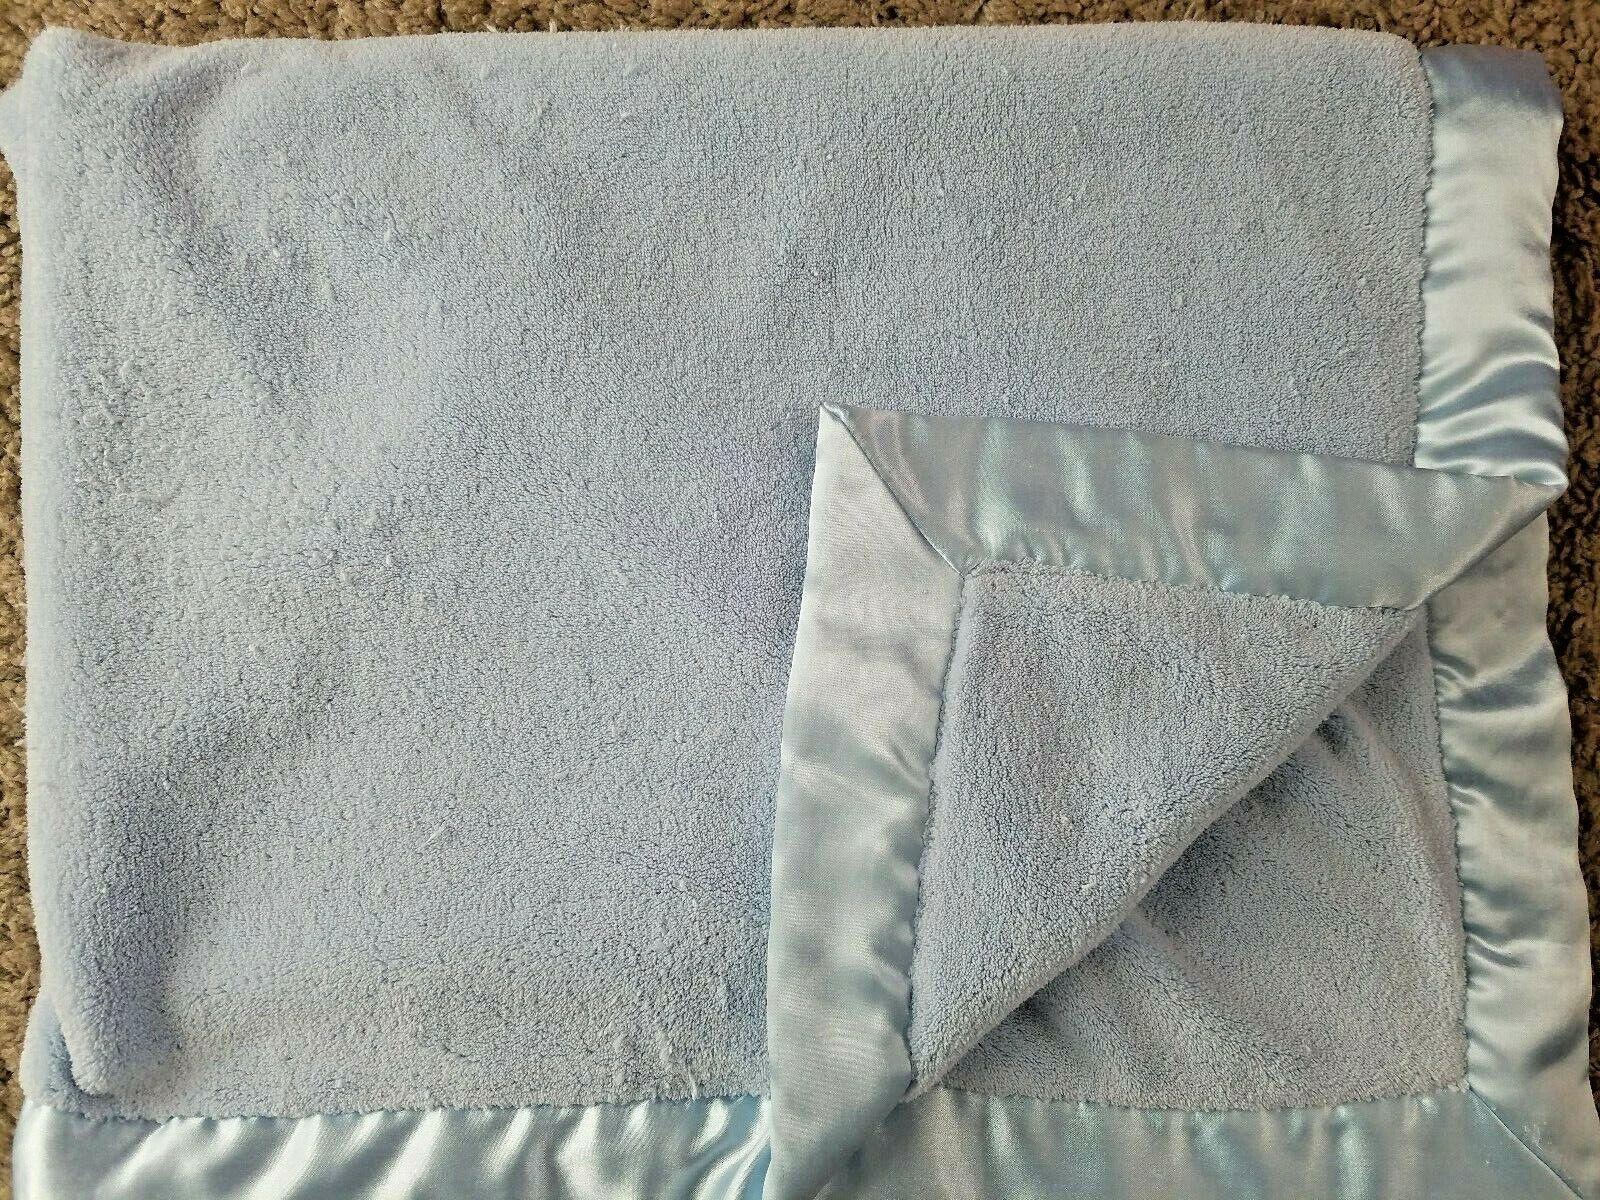 Koala Baby Toys R Us Baby Blanket Solid Light Blue Satin - $30.43